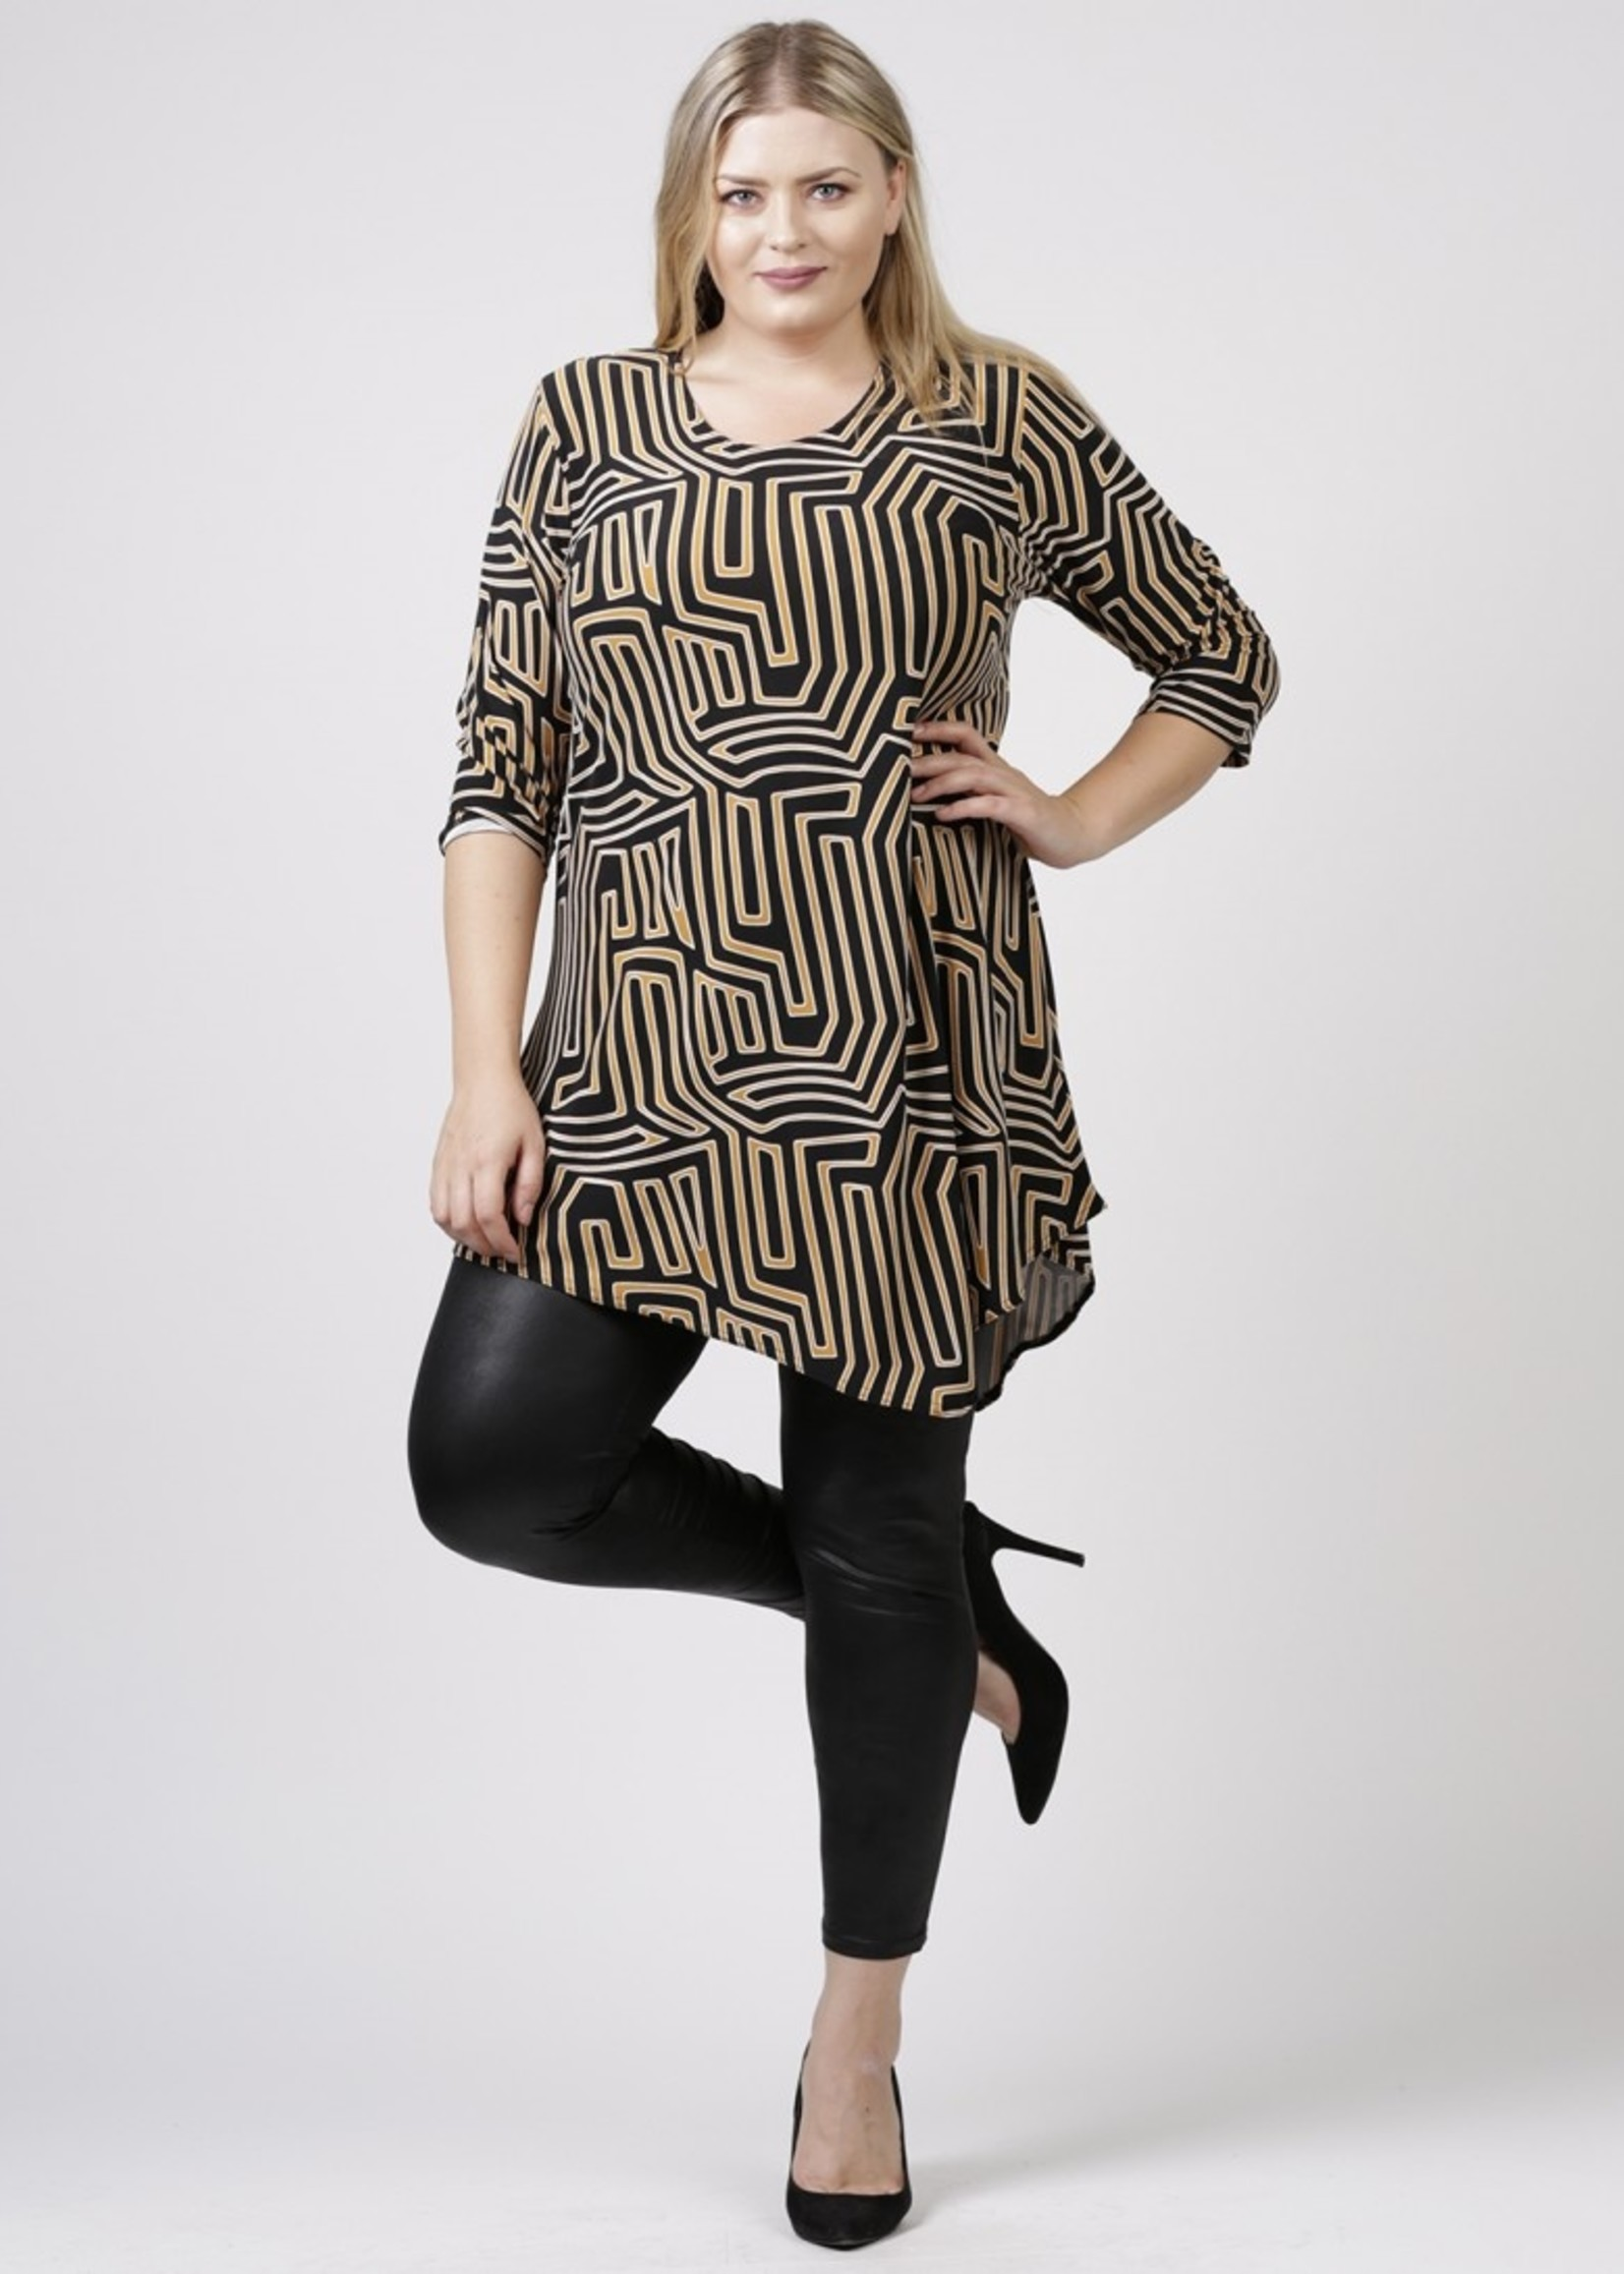 Magna Fashion Shirt B93 PRINT II